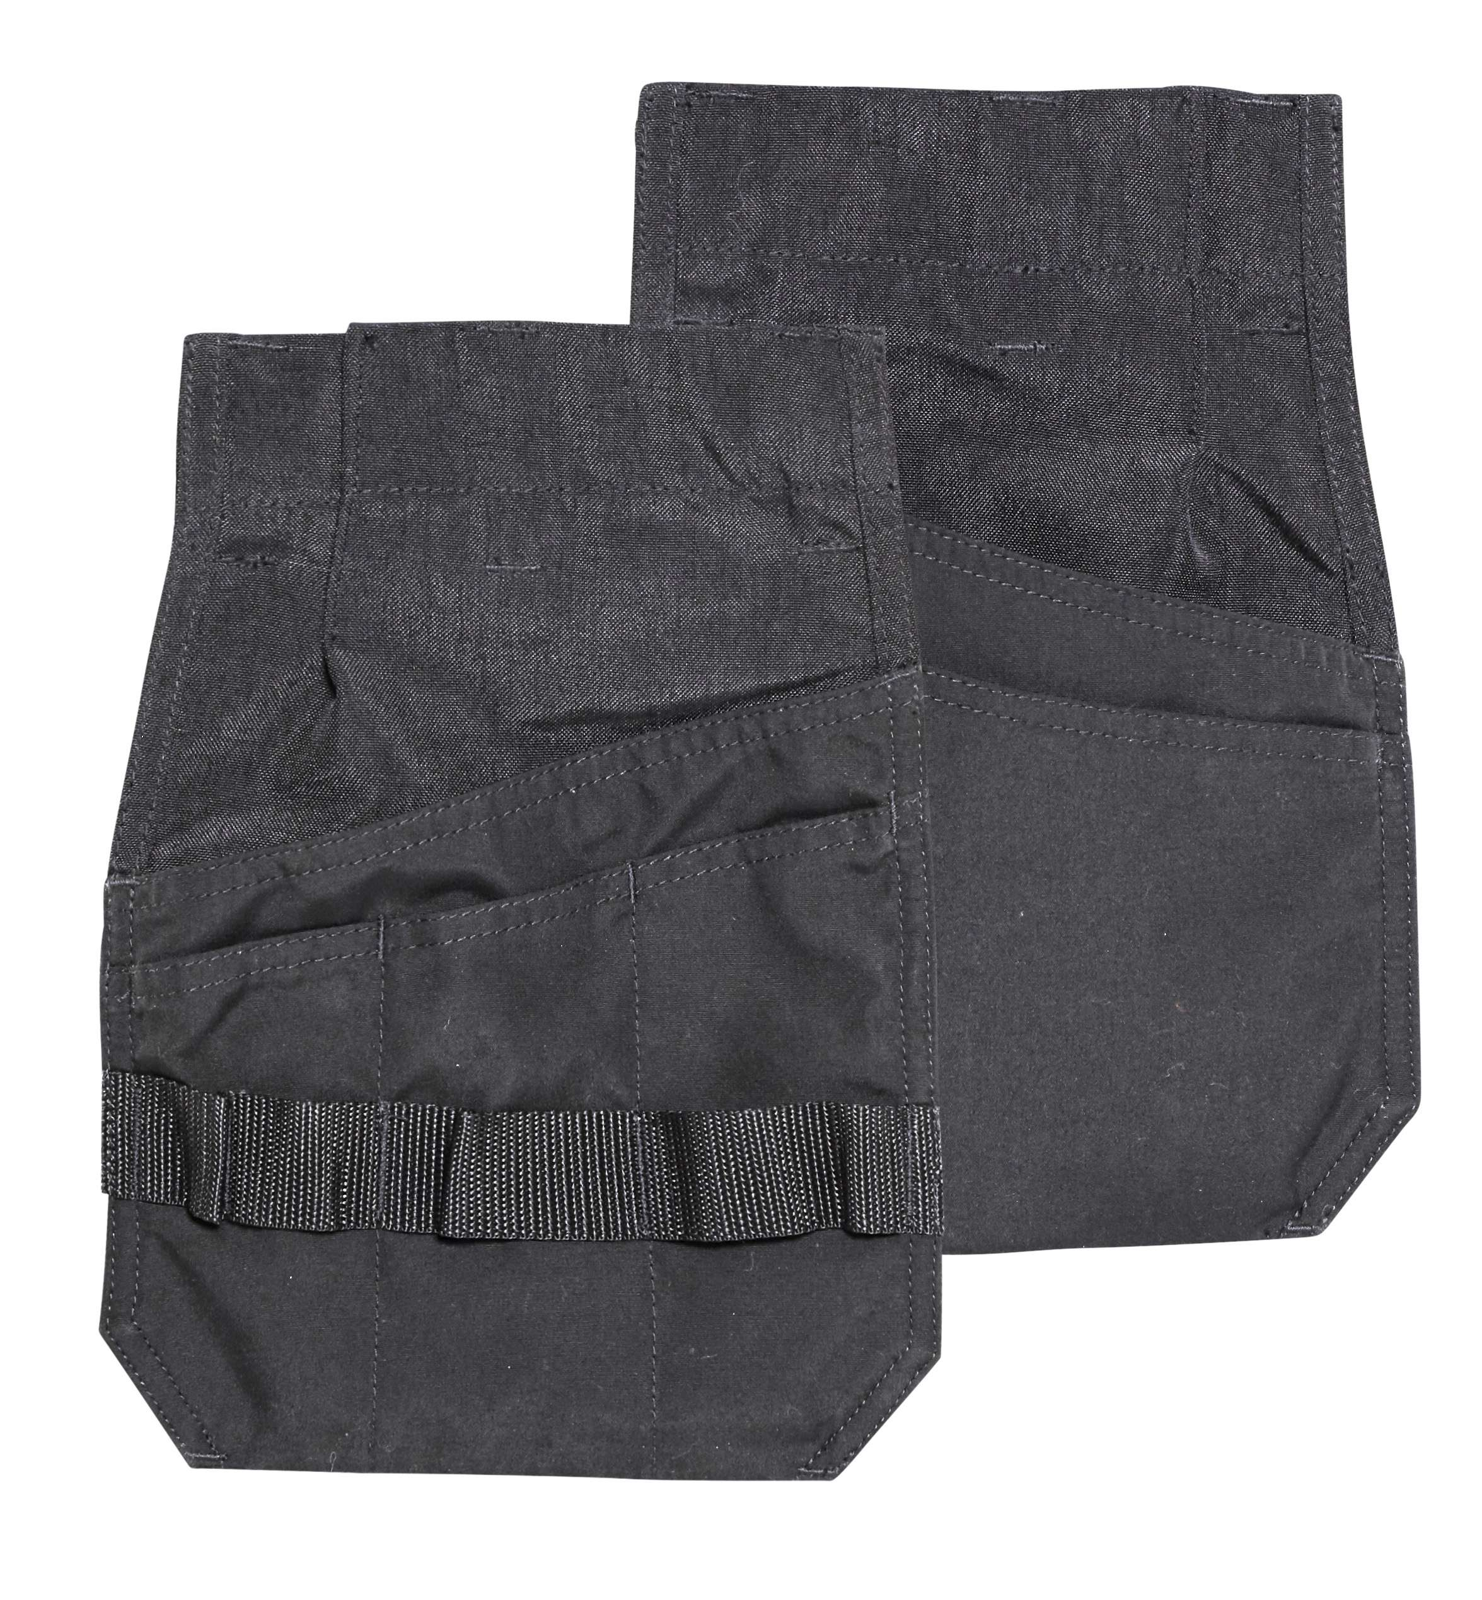 Blaklader Losse spijkerzakken 21591845 donkergrijs(9800)